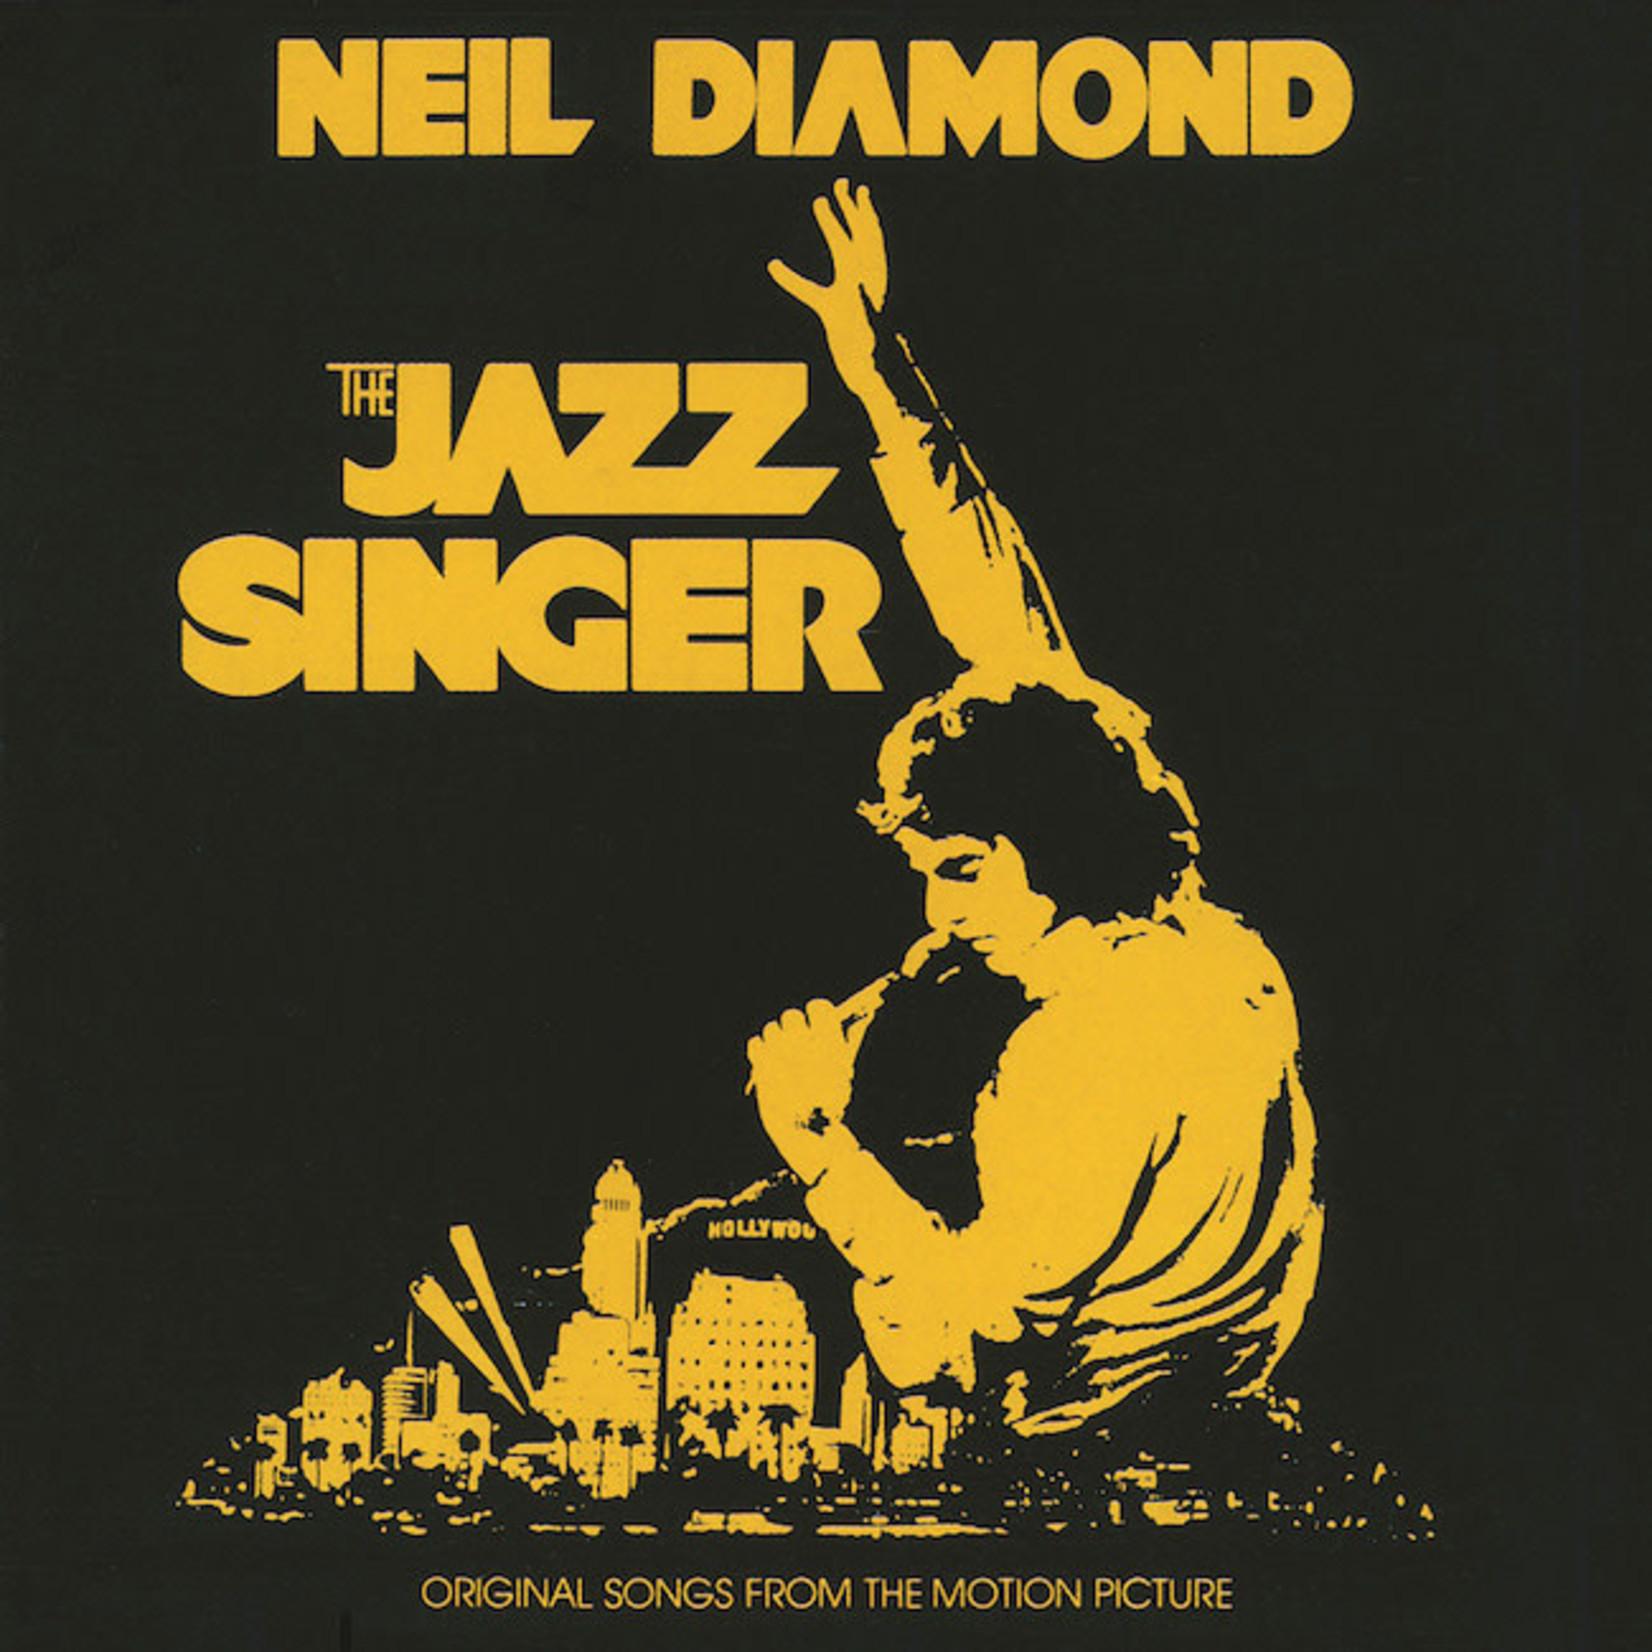 [Vintage] Diamond, Neil: Jazz Singer